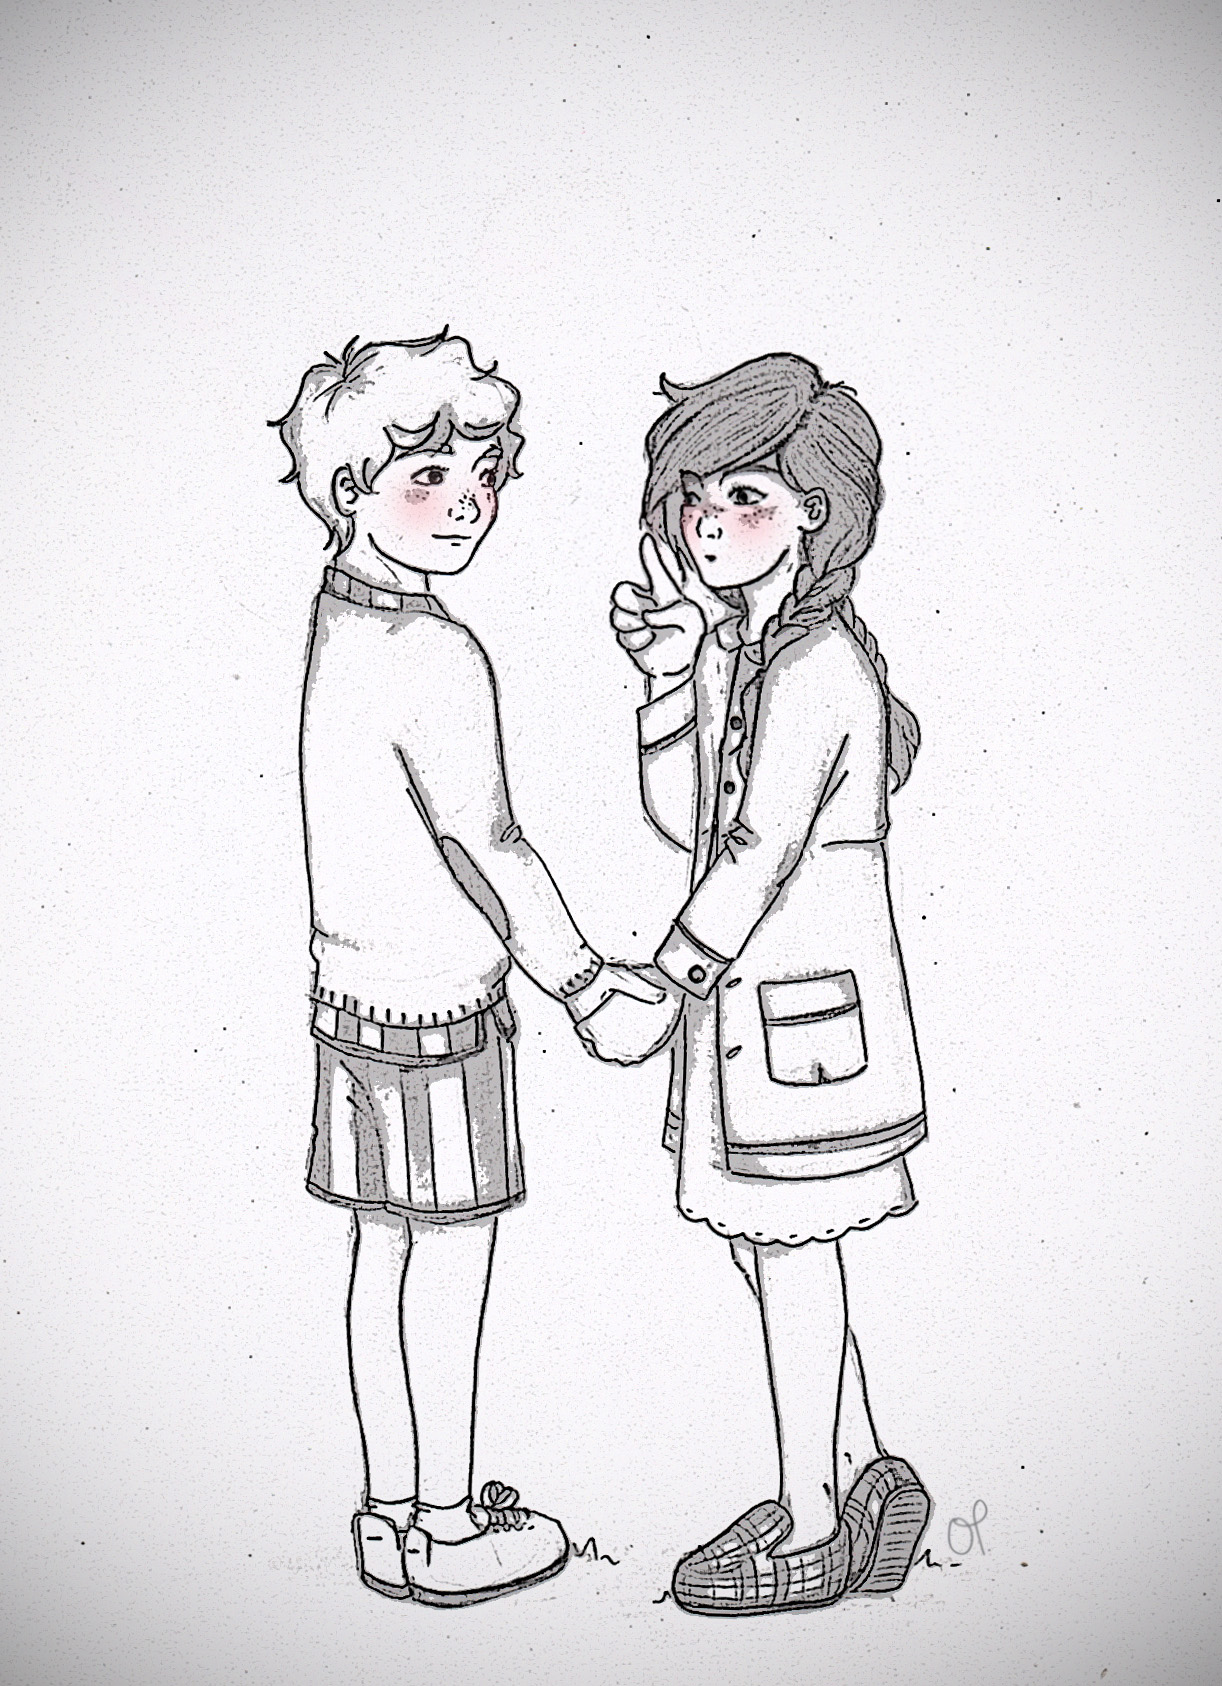 1222x1686 Drawing Of Girl And Boy Tumblr Young Everlark Tumblr. Drawings